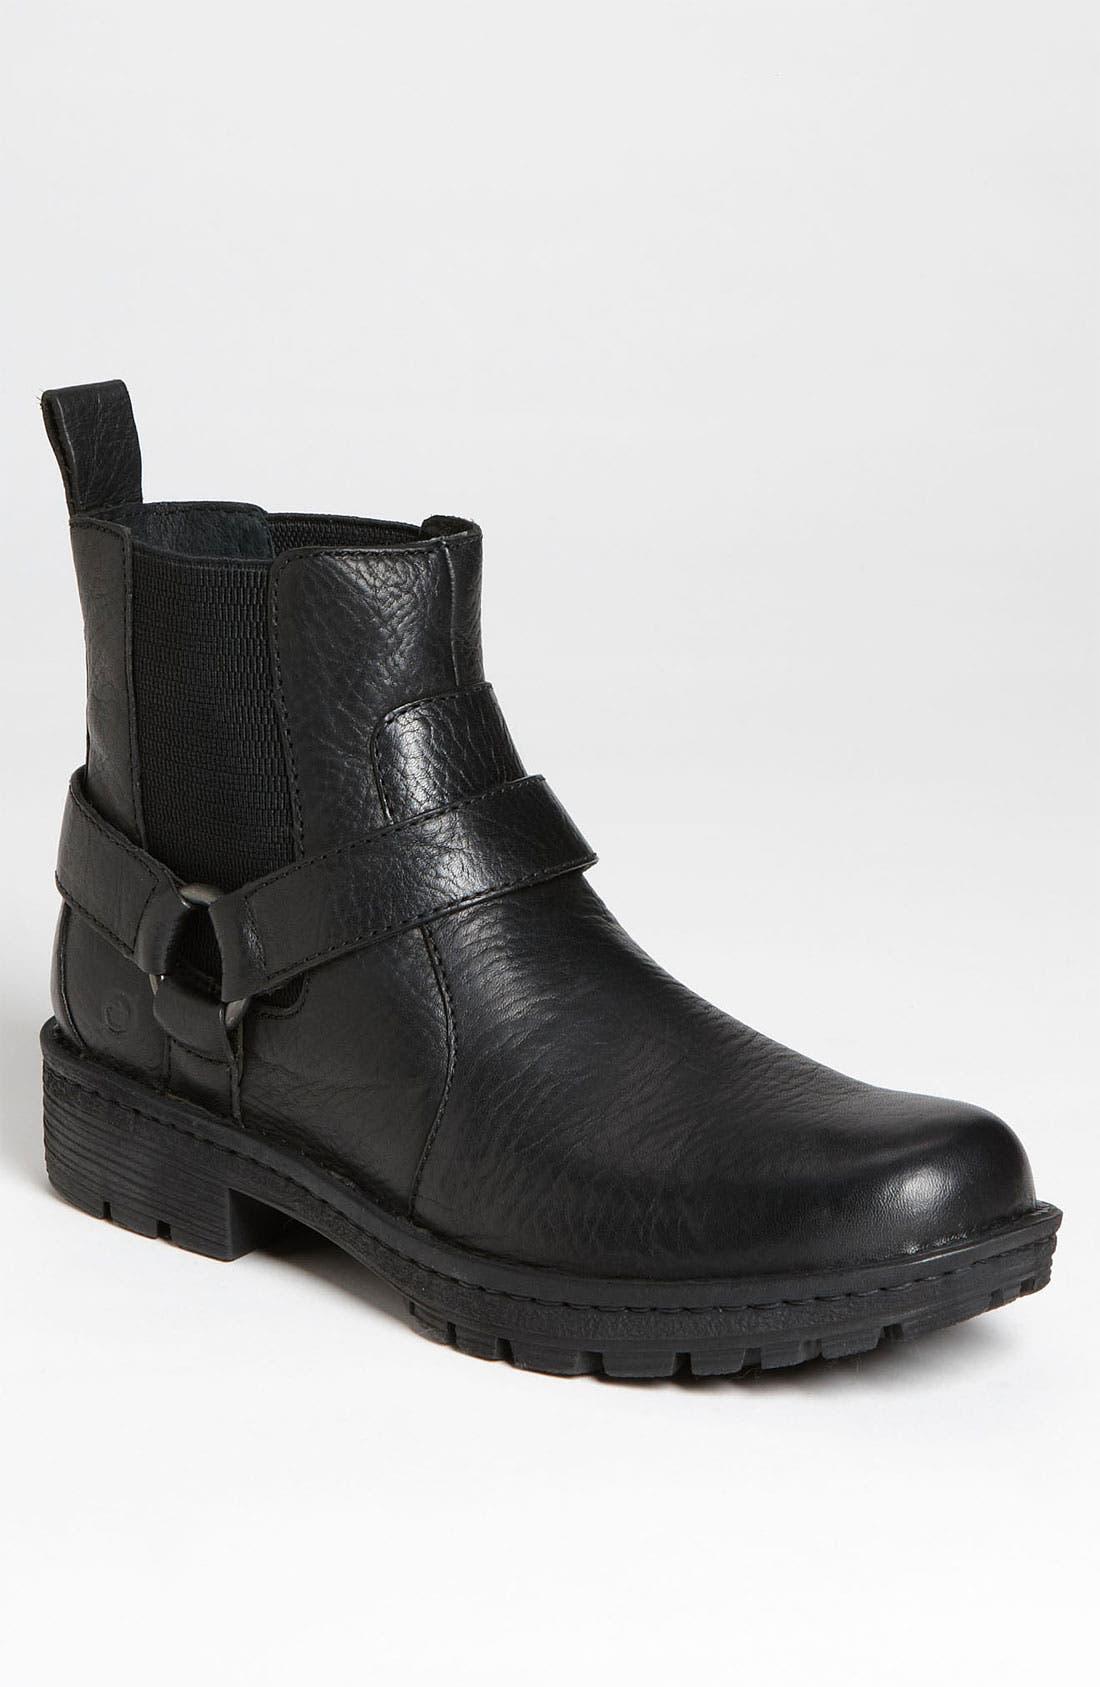 Main Image - Børn 'Brunell' Harness Chelsea Boot (Men)